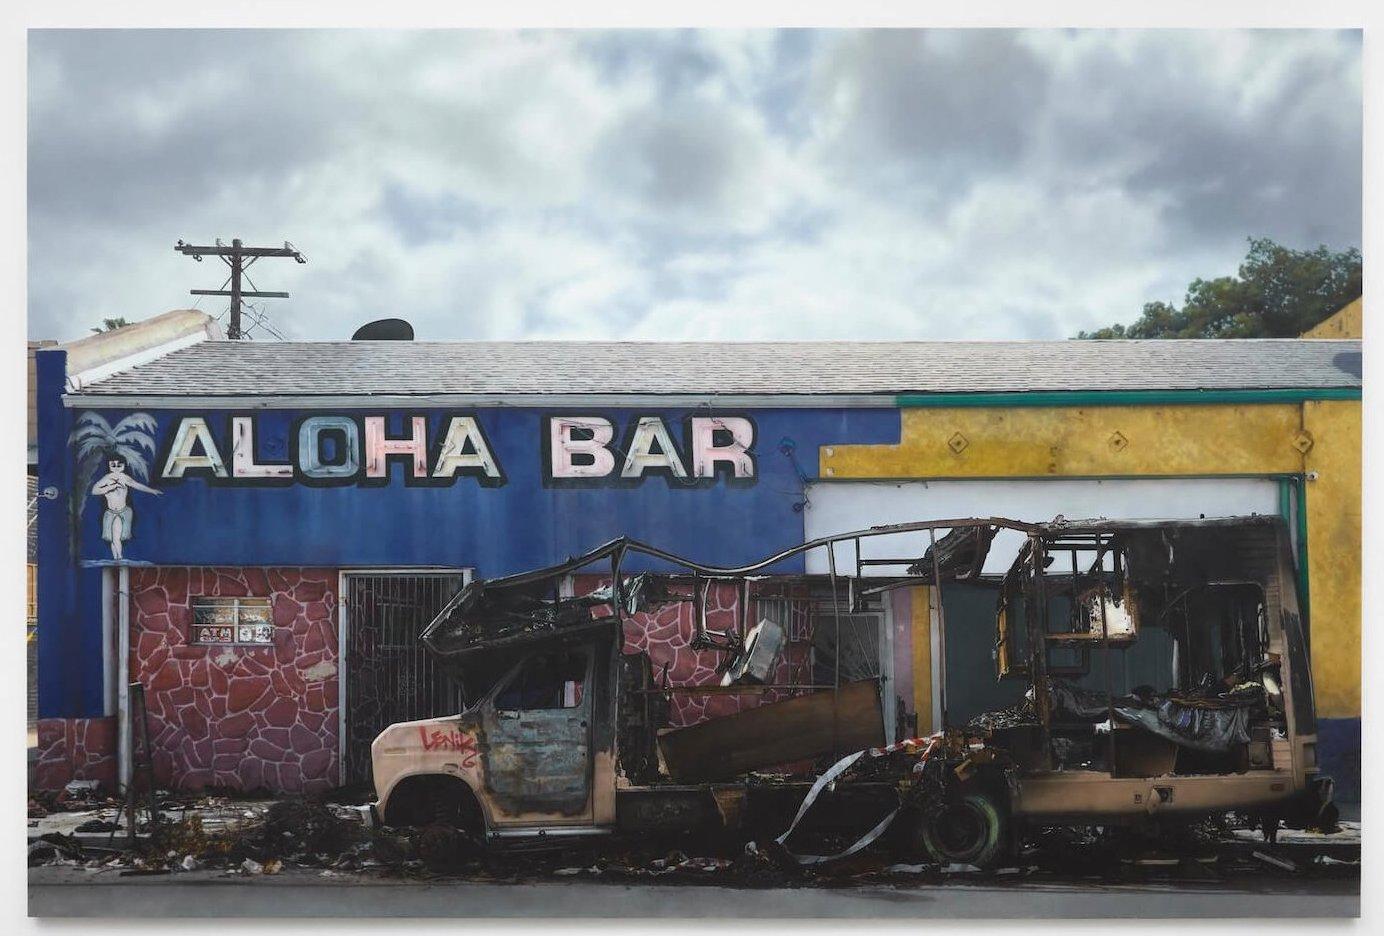 Gomez, Aloha, 2021 (SG 21.029) A